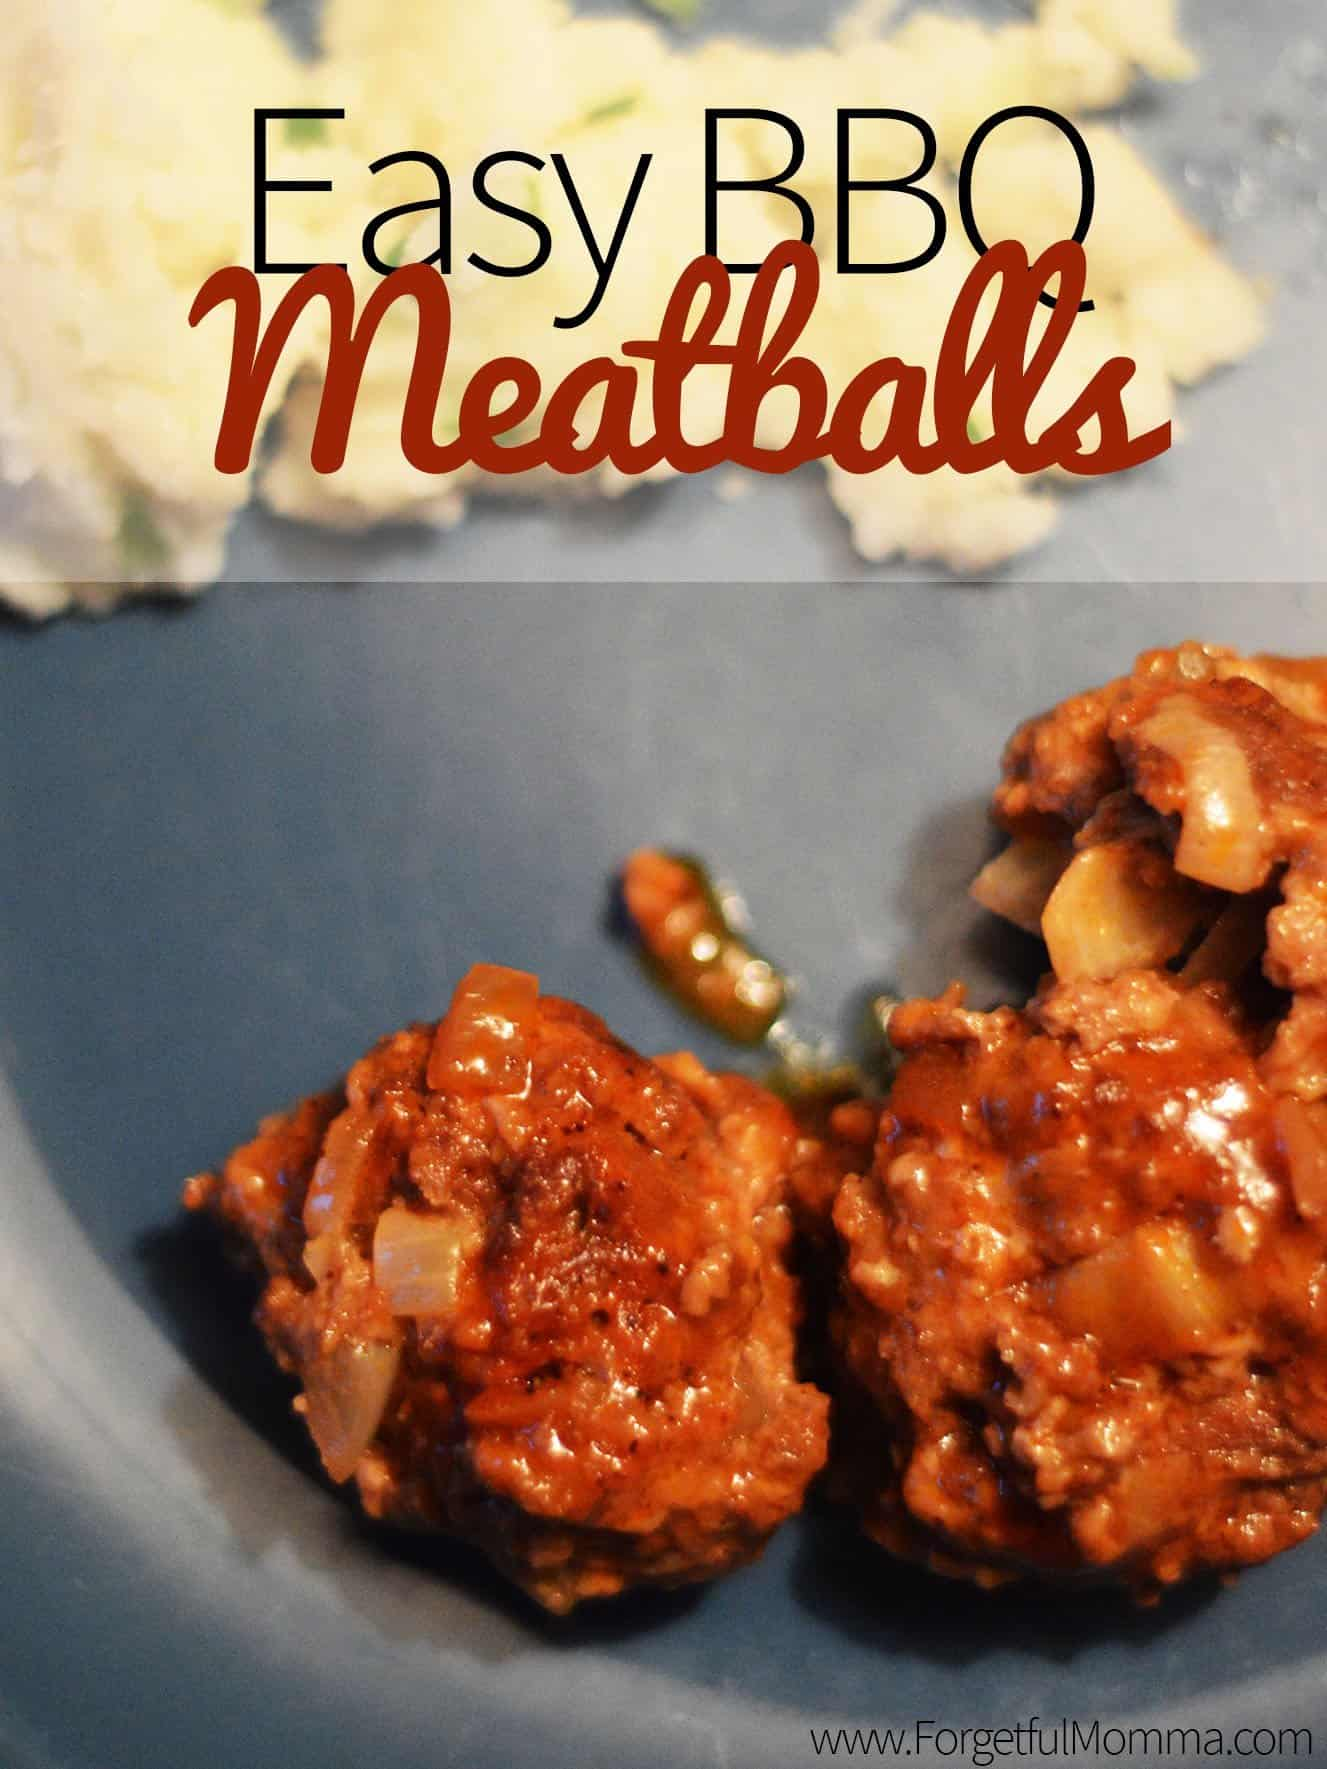 Easy BBQ Meatballs